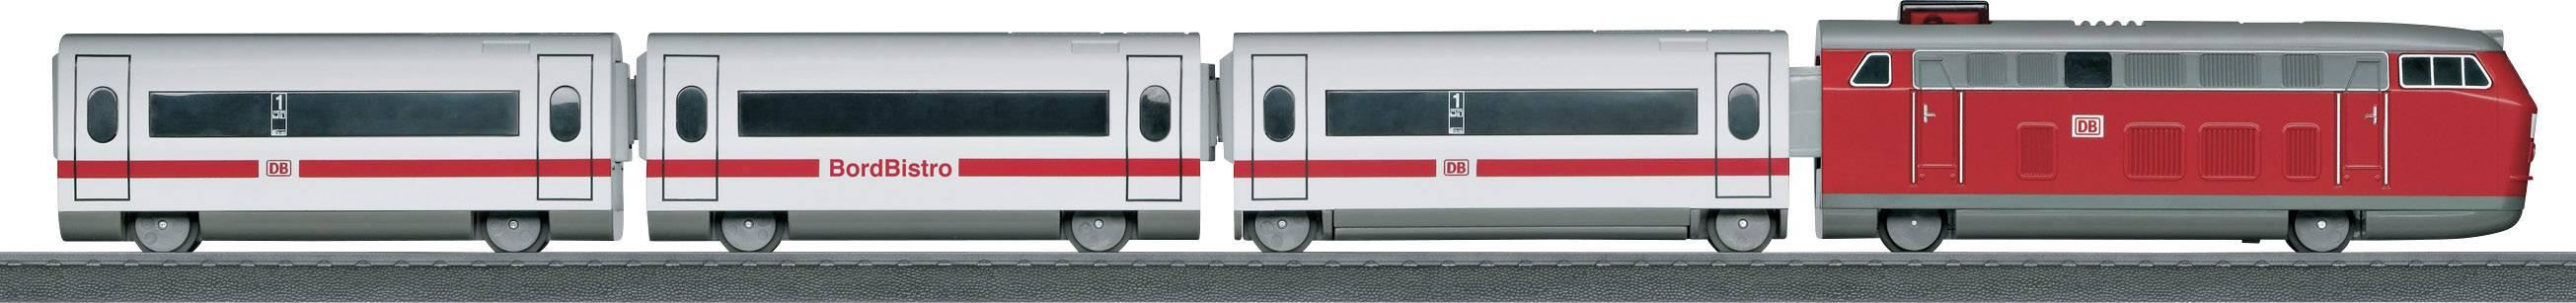 Startovací sada vlaku Intercity Märklin my world 29302 H0